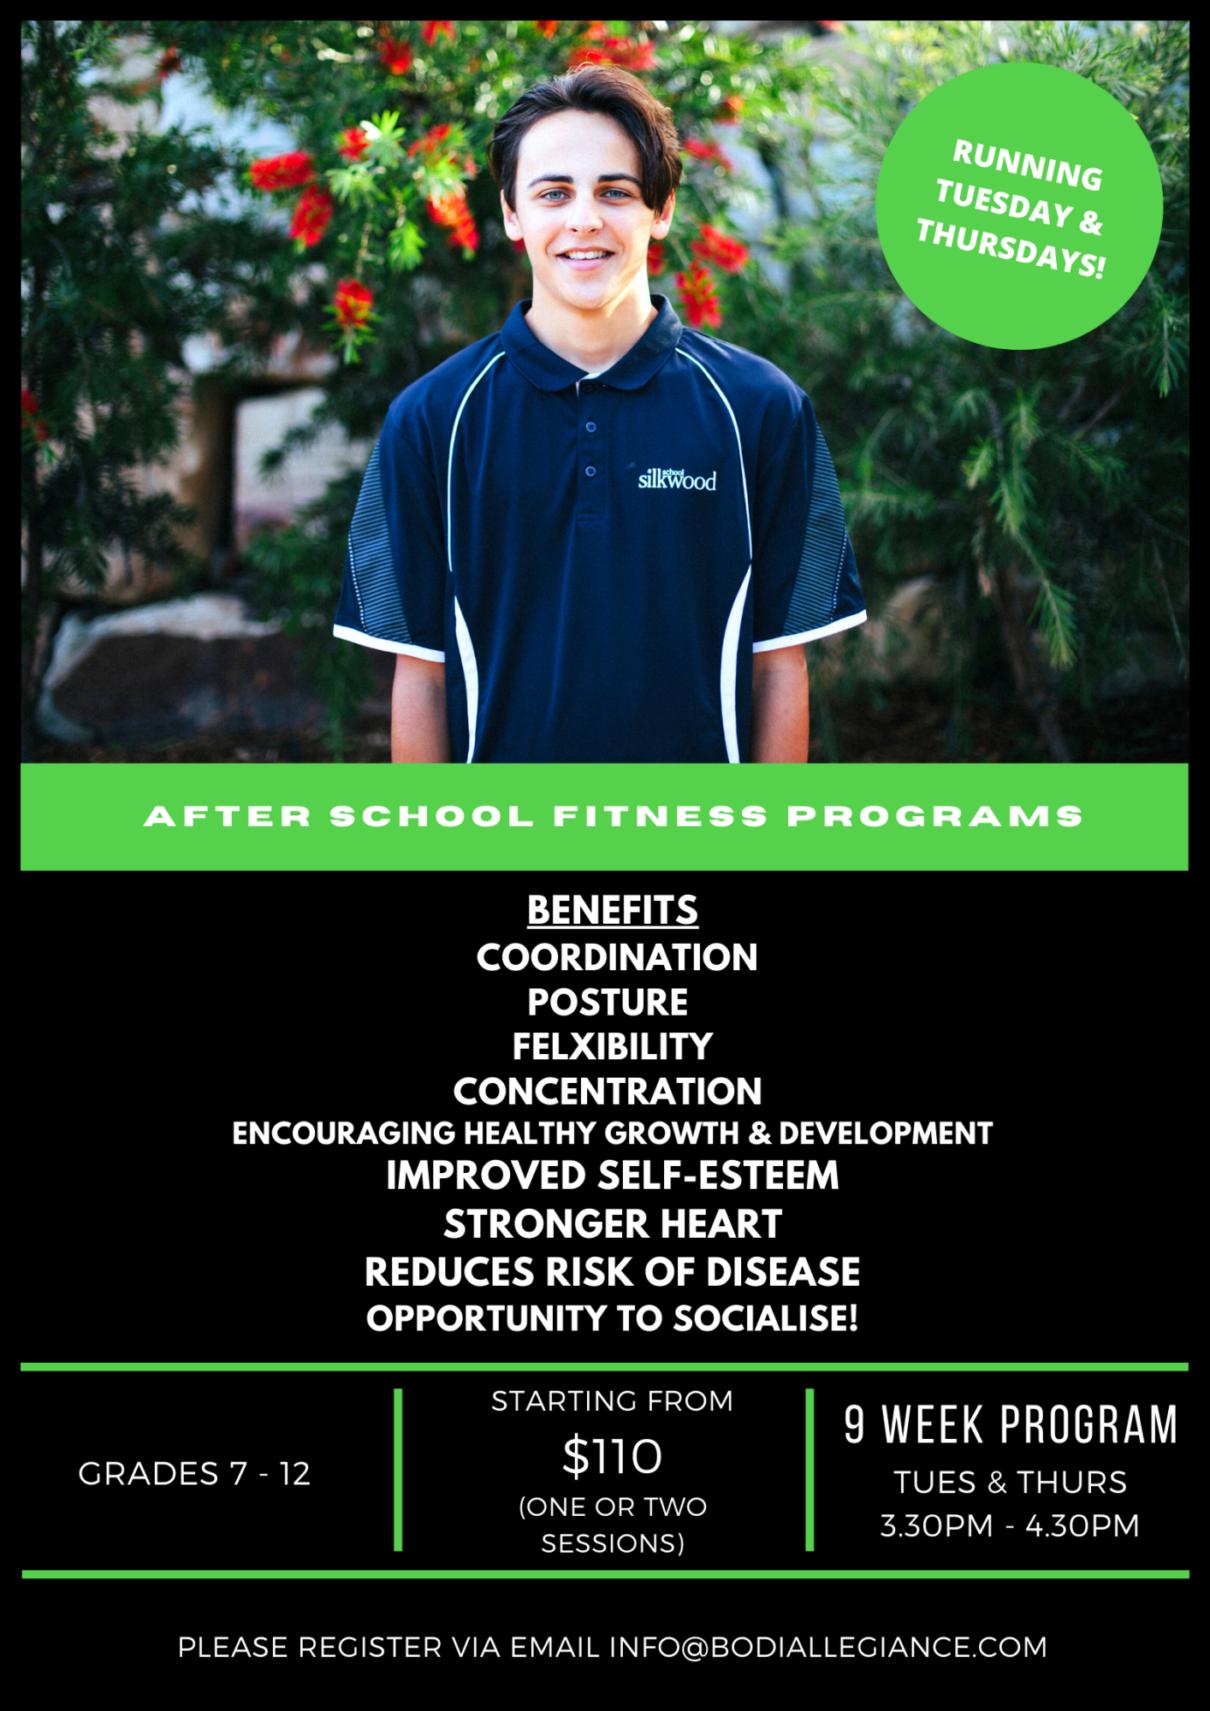 Bodi Allegiance High School Fitness Program - Silkwood School